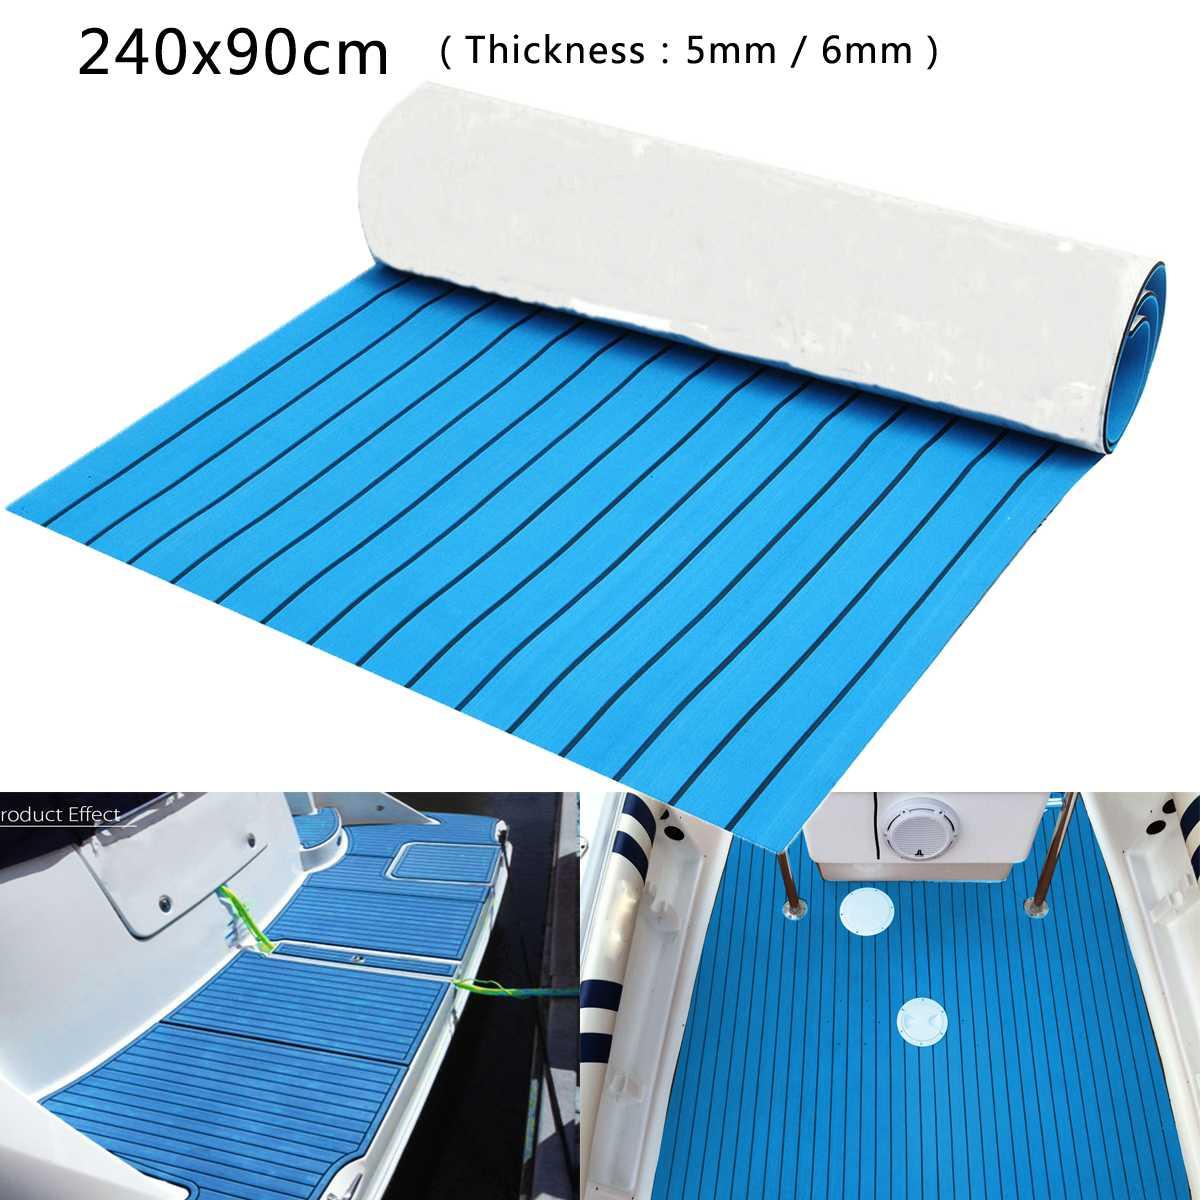 5mm/6mm 240x90cm EVA Foam Boat Flooring Faux Teak Decking Sheet Pad for Yacht RV CAR Boat Blue Black Lines(China)